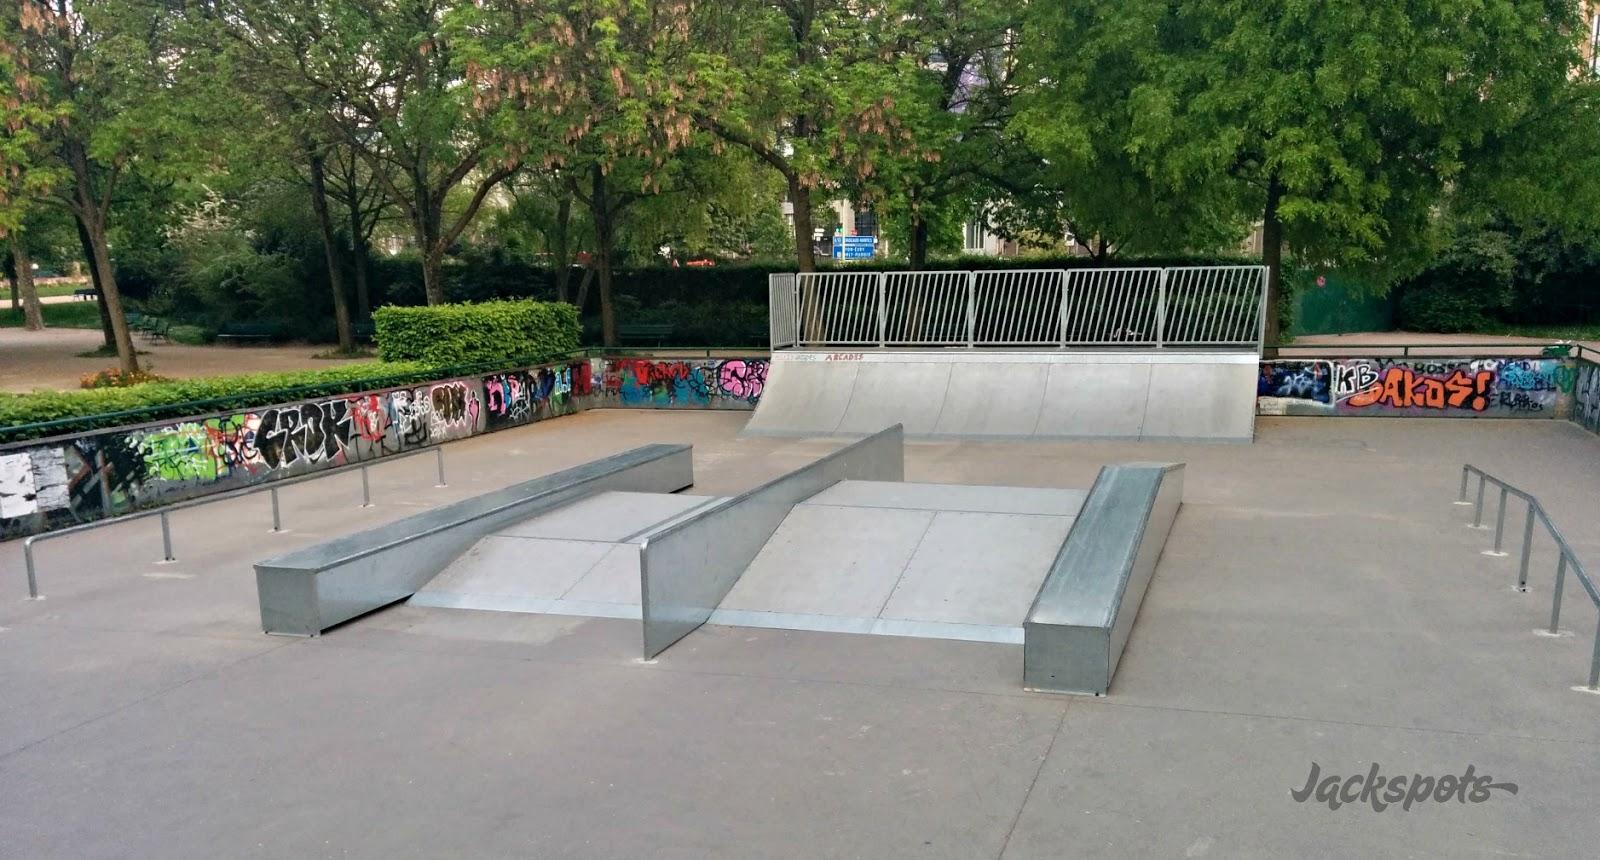 le skatepark parisien de porte d 39 orl ans jackspots. Black Bedroom Furniture Sets. Home Design Ideas